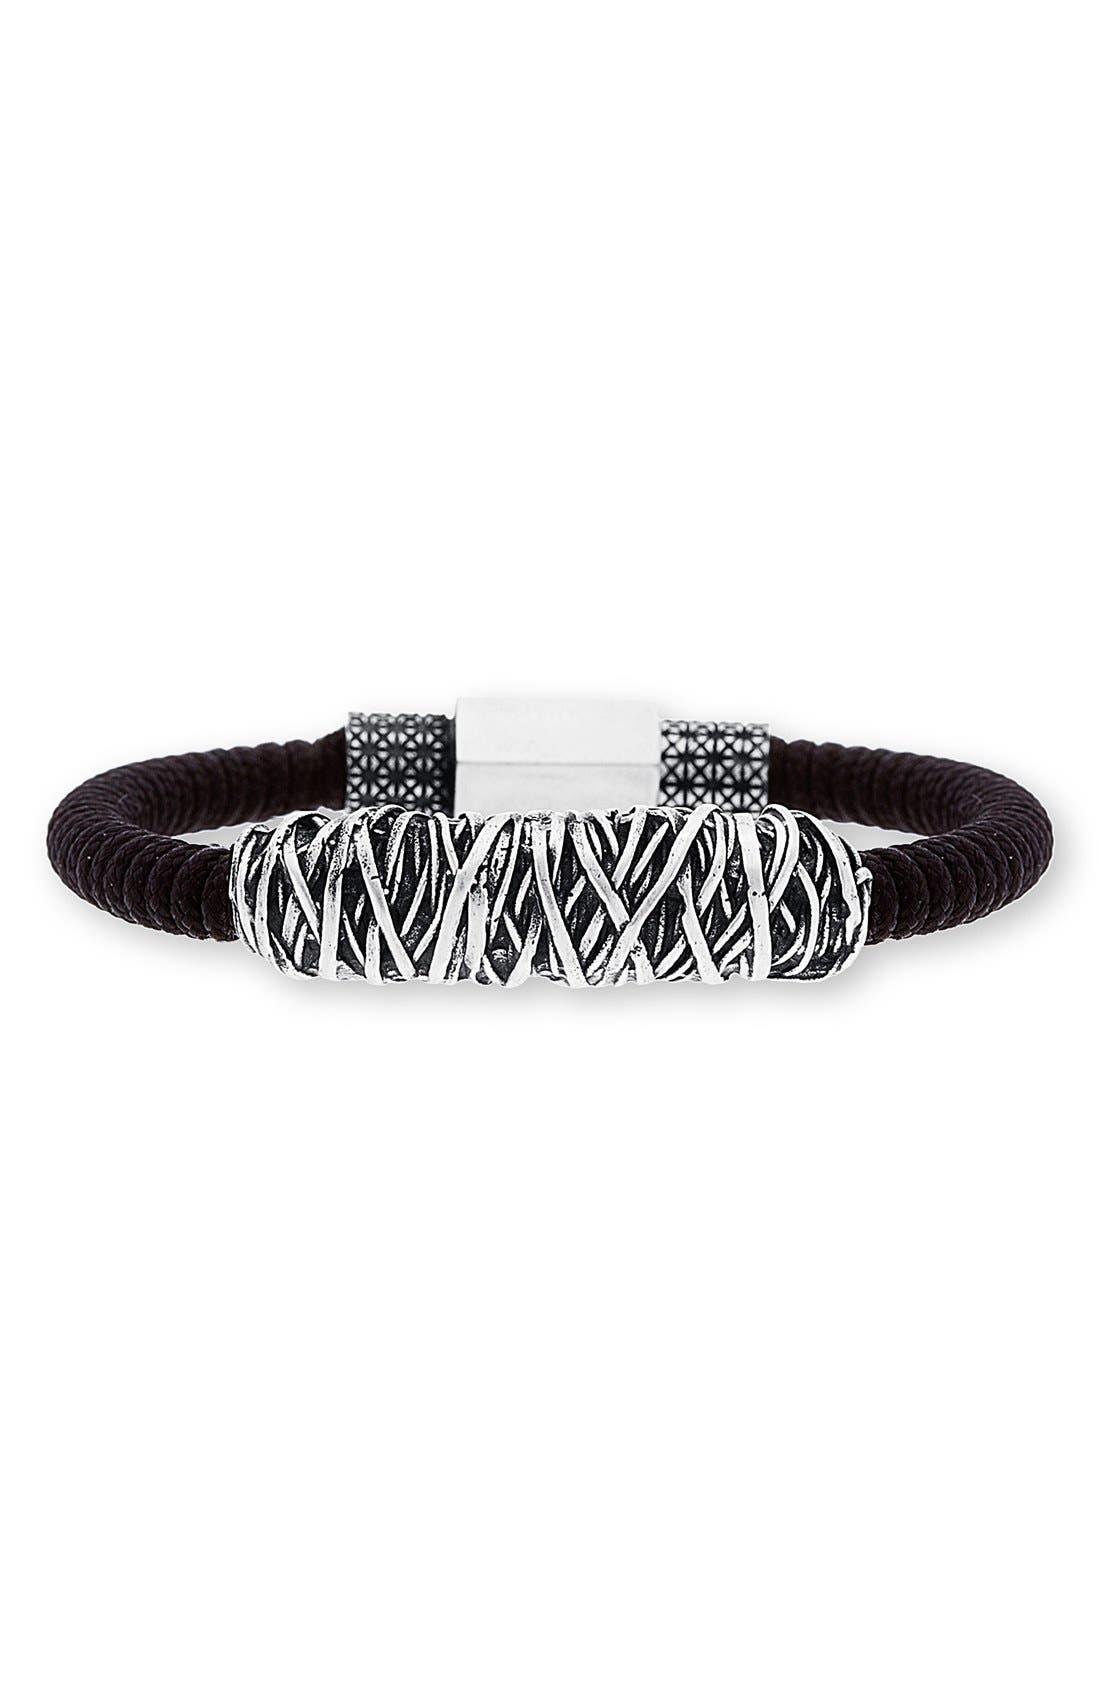 Twisted Metal Cord Bracelet,                             Main thumbnail 1, color,                             001